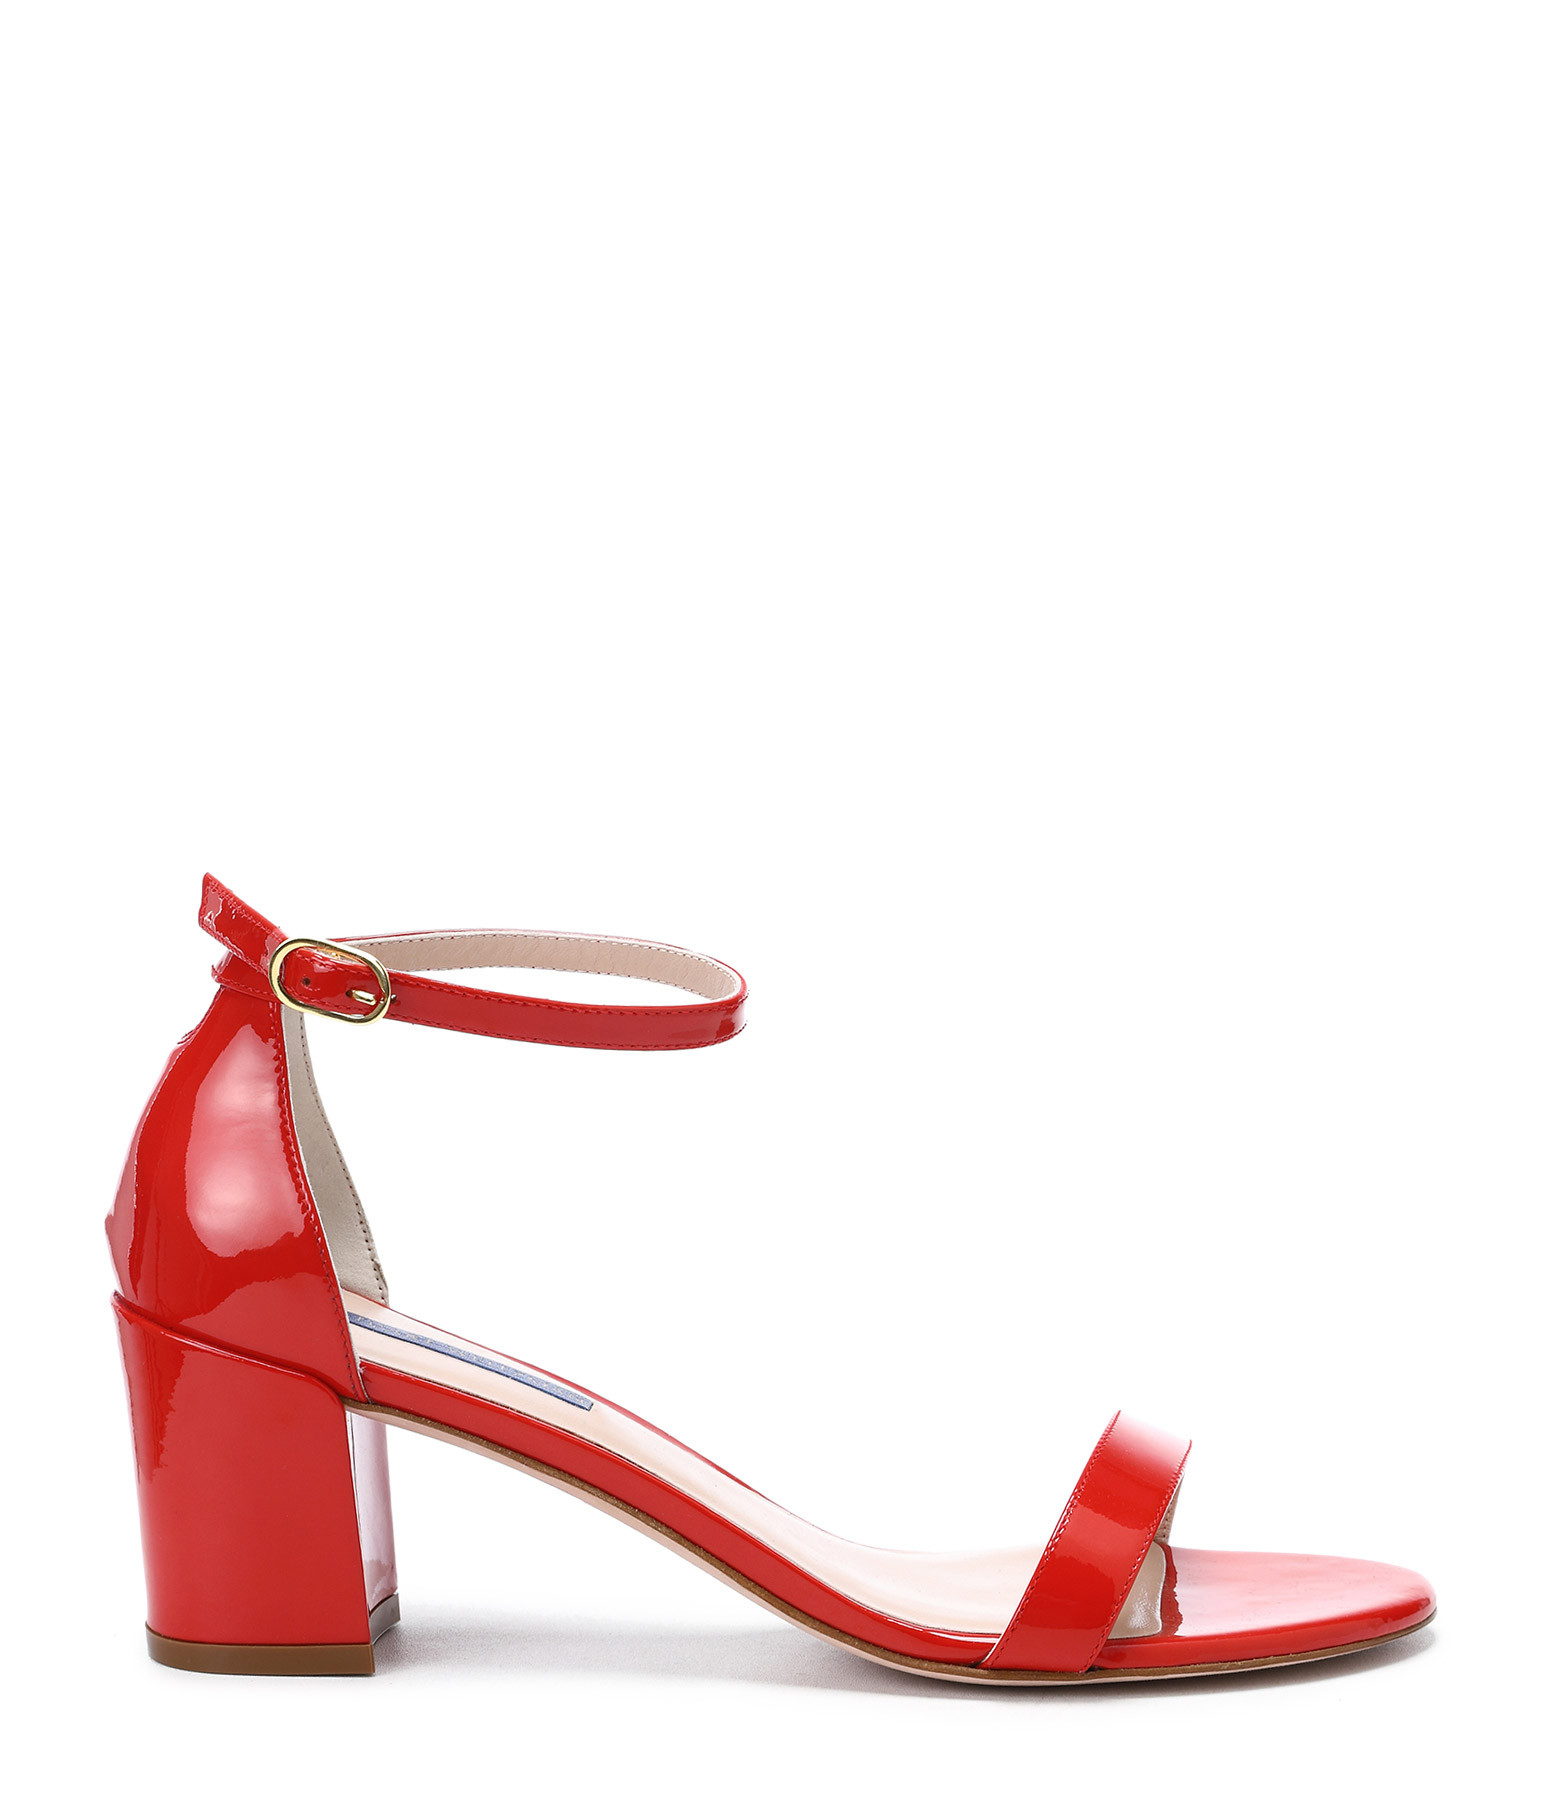 STUART WEITZMAN - Sandales Simple Rouge Verni